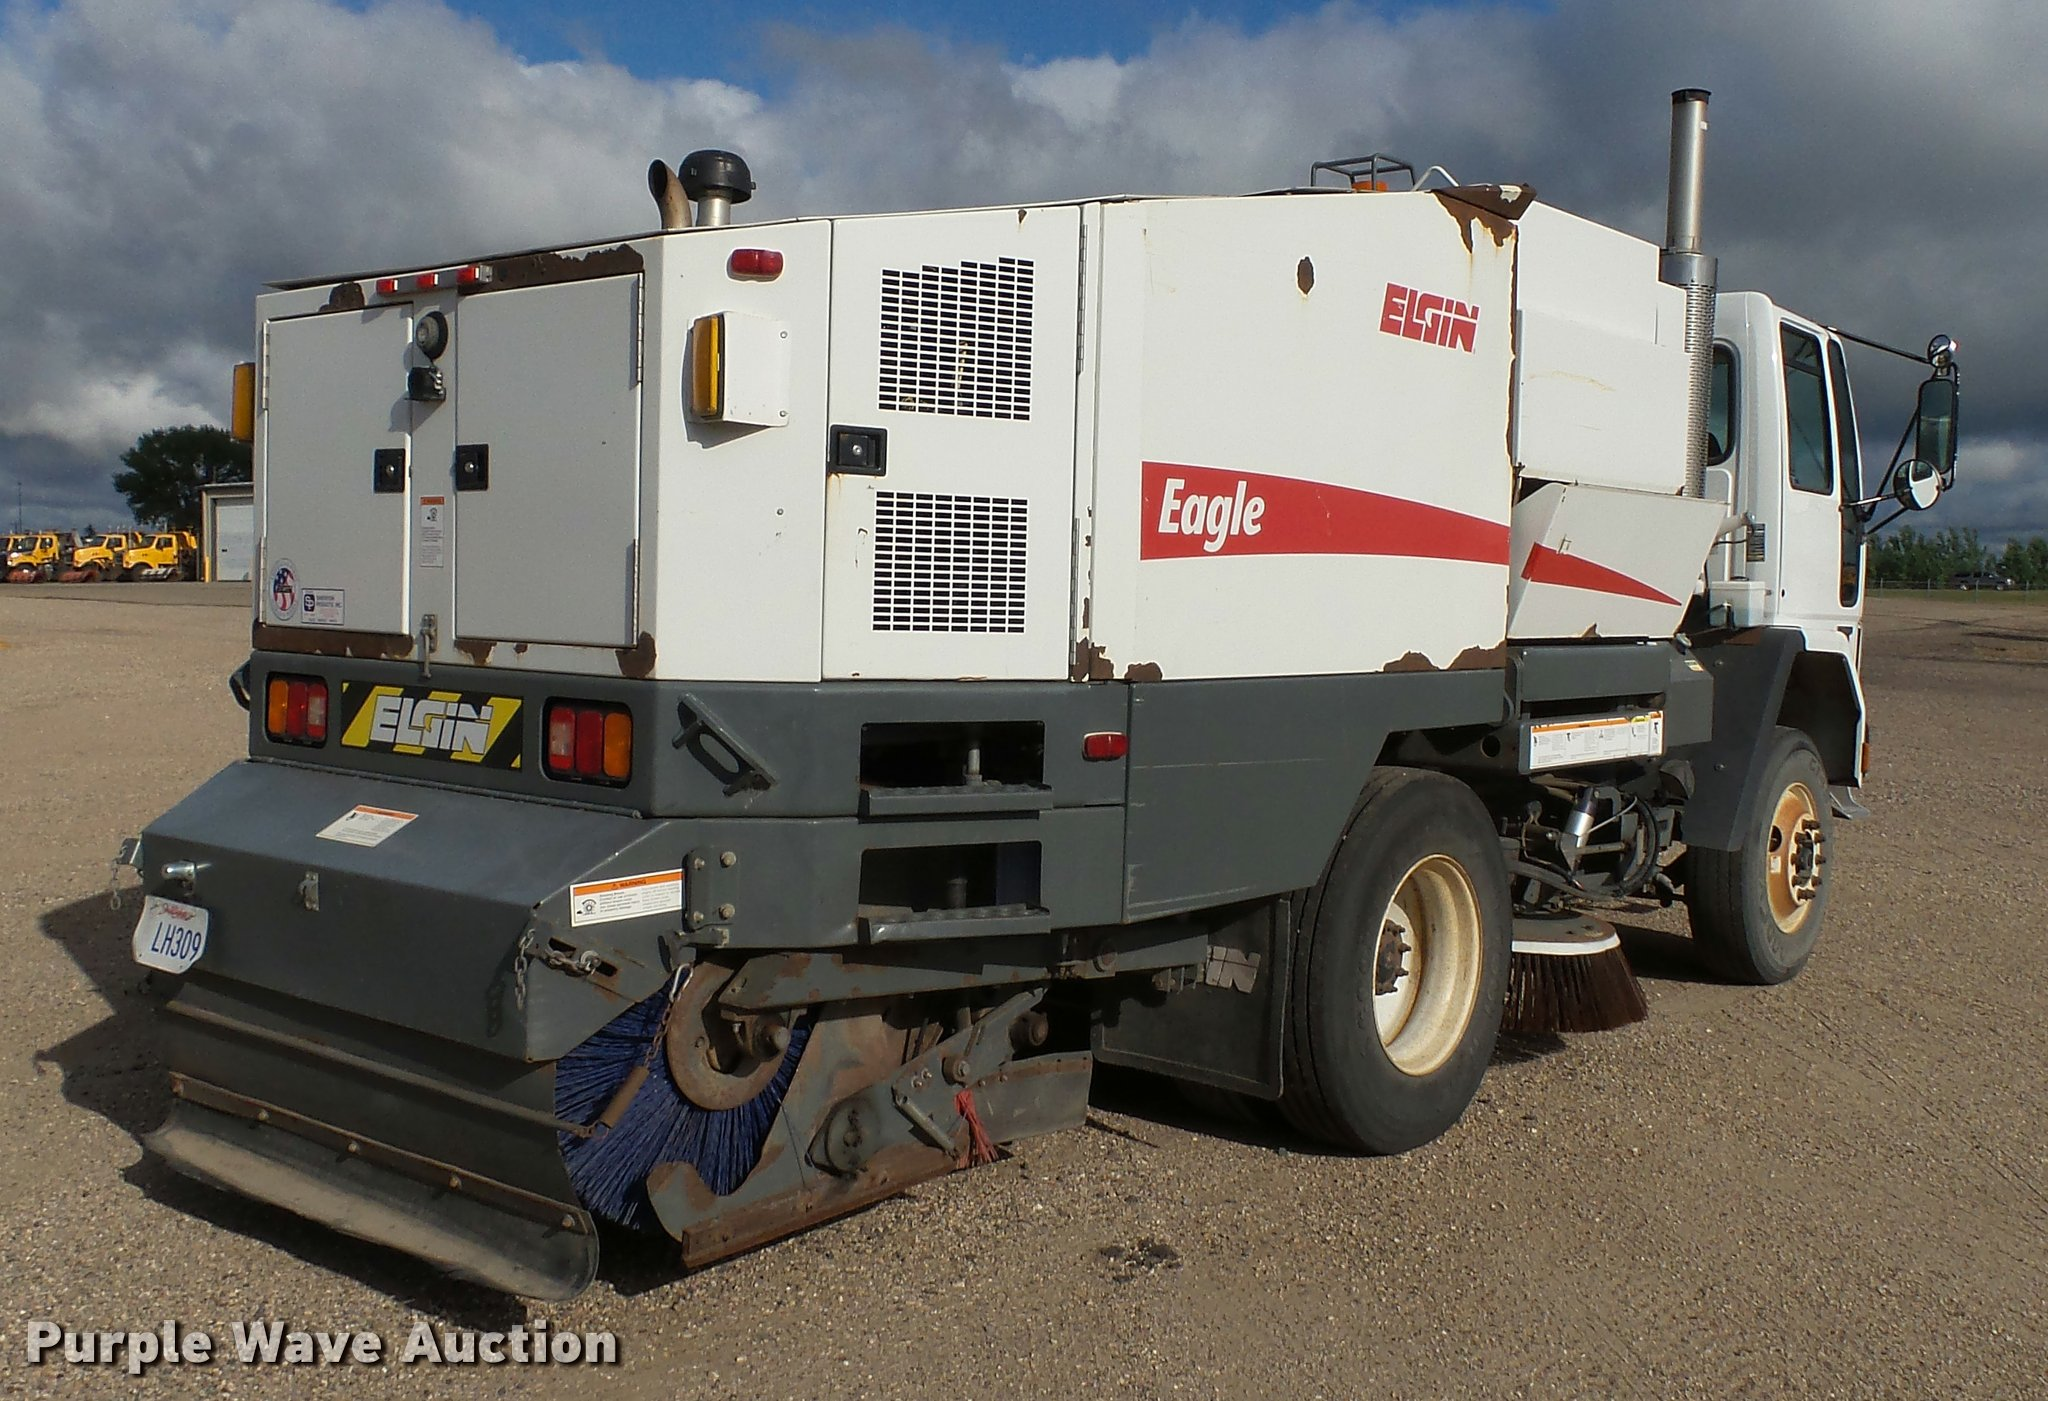 ... Elgin Eagle Series F street sweeper Full size in new window ...